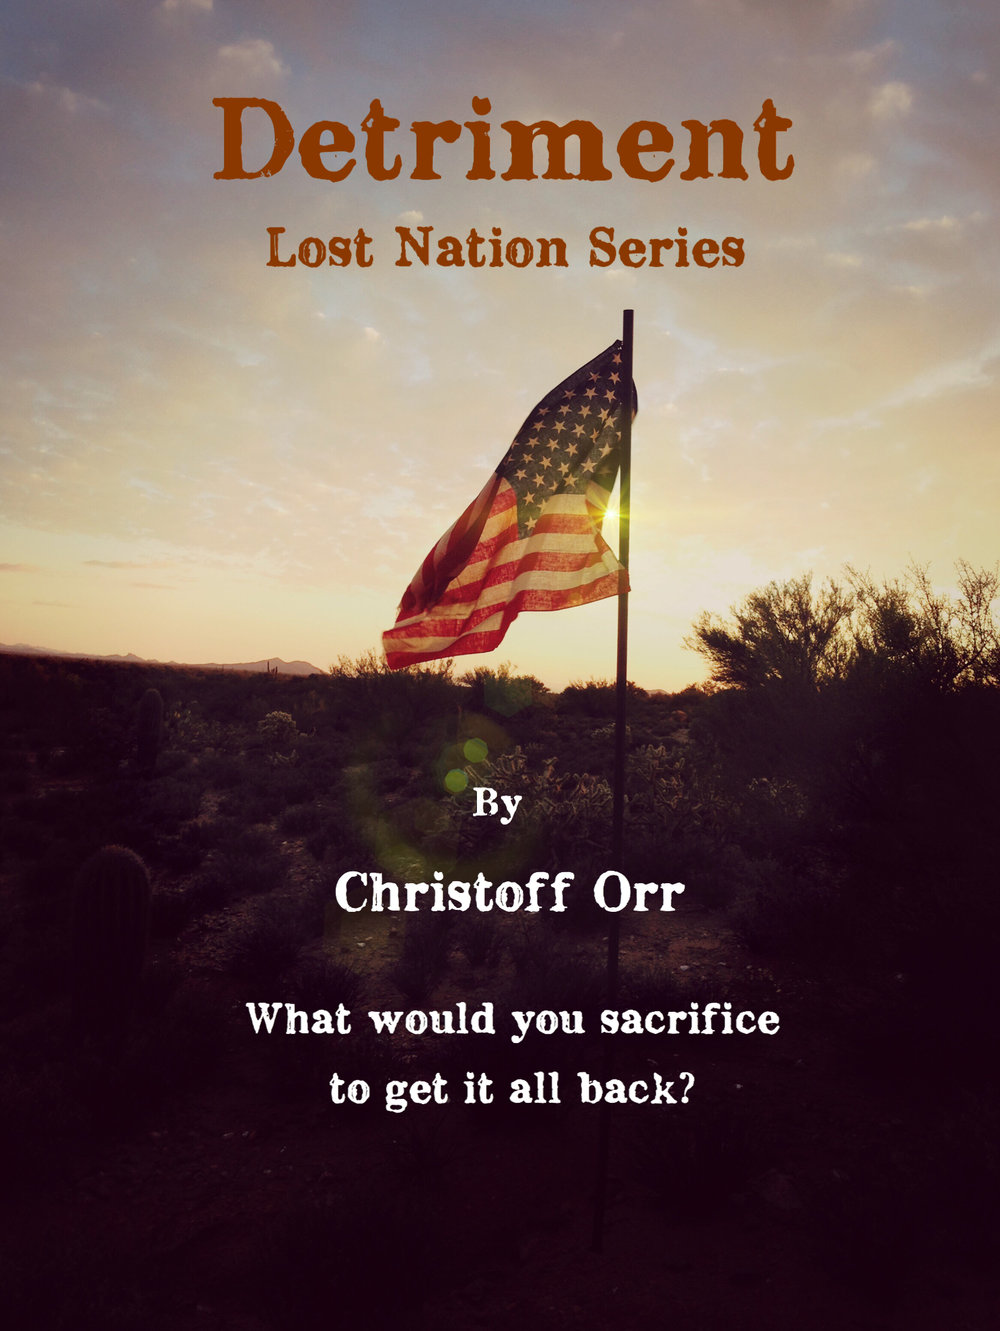 Lost Nation Series: Detriment